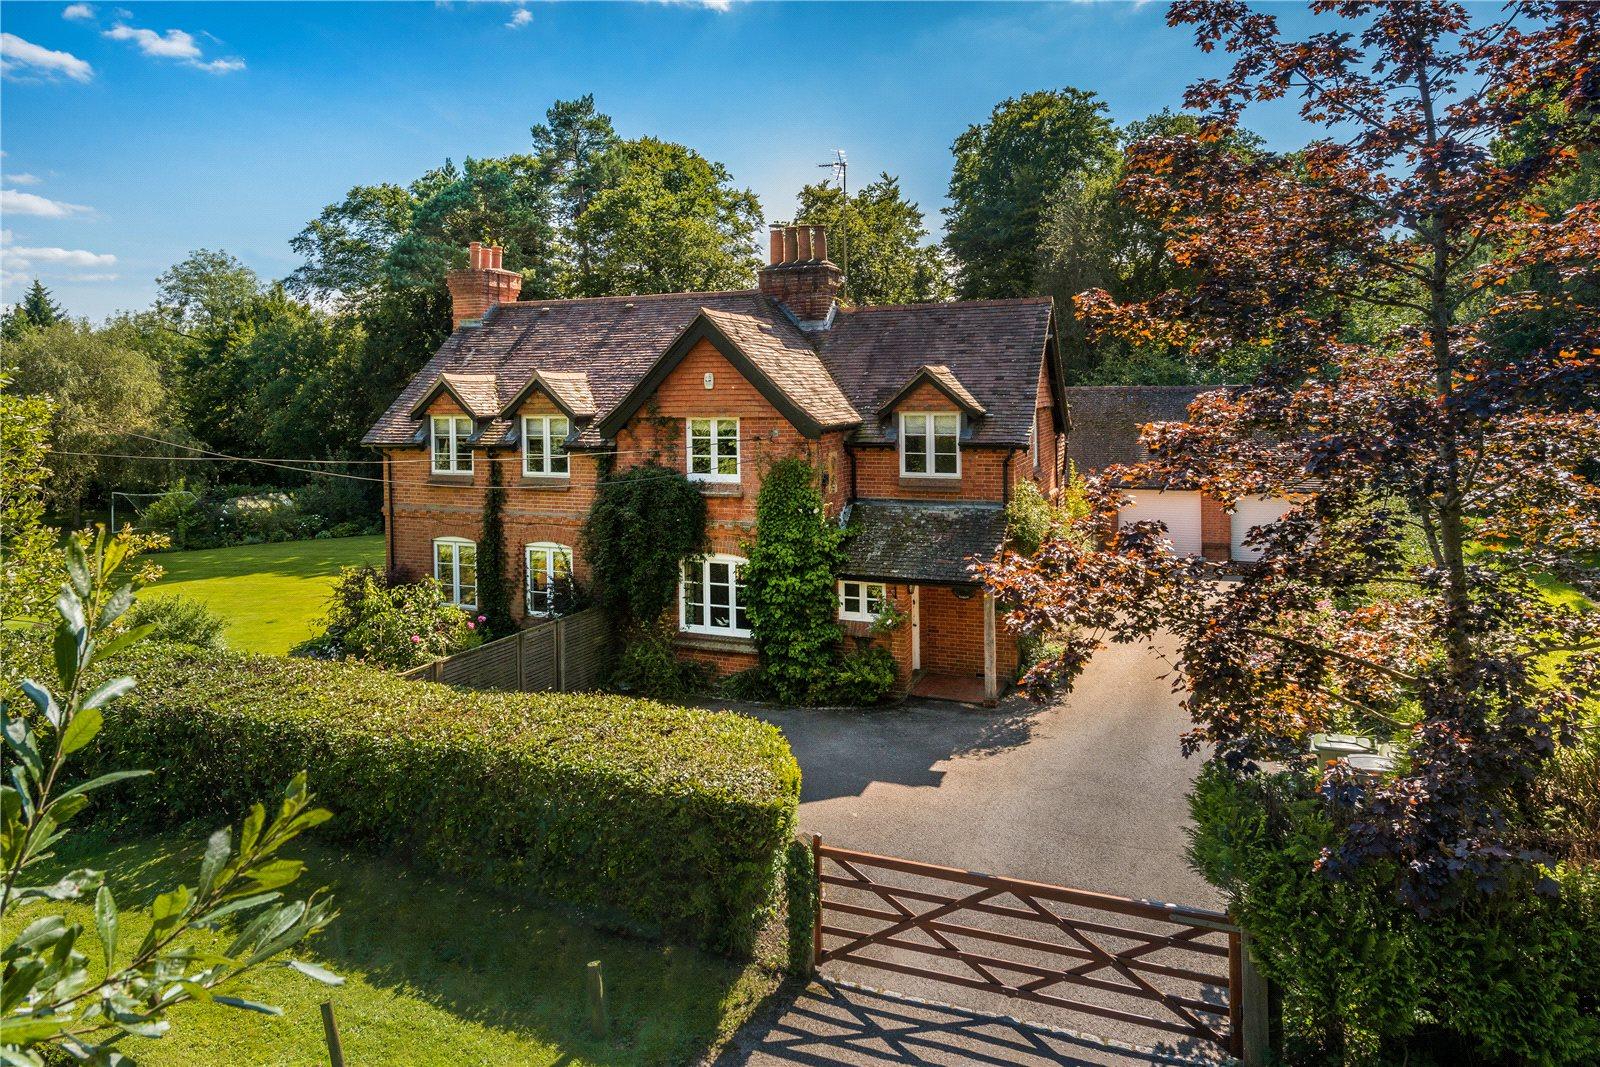 Nhà ở một gia đình vì Bán tại Dockenfield, Farnham, Surrey, GU10 Farnham, Anh Quốc